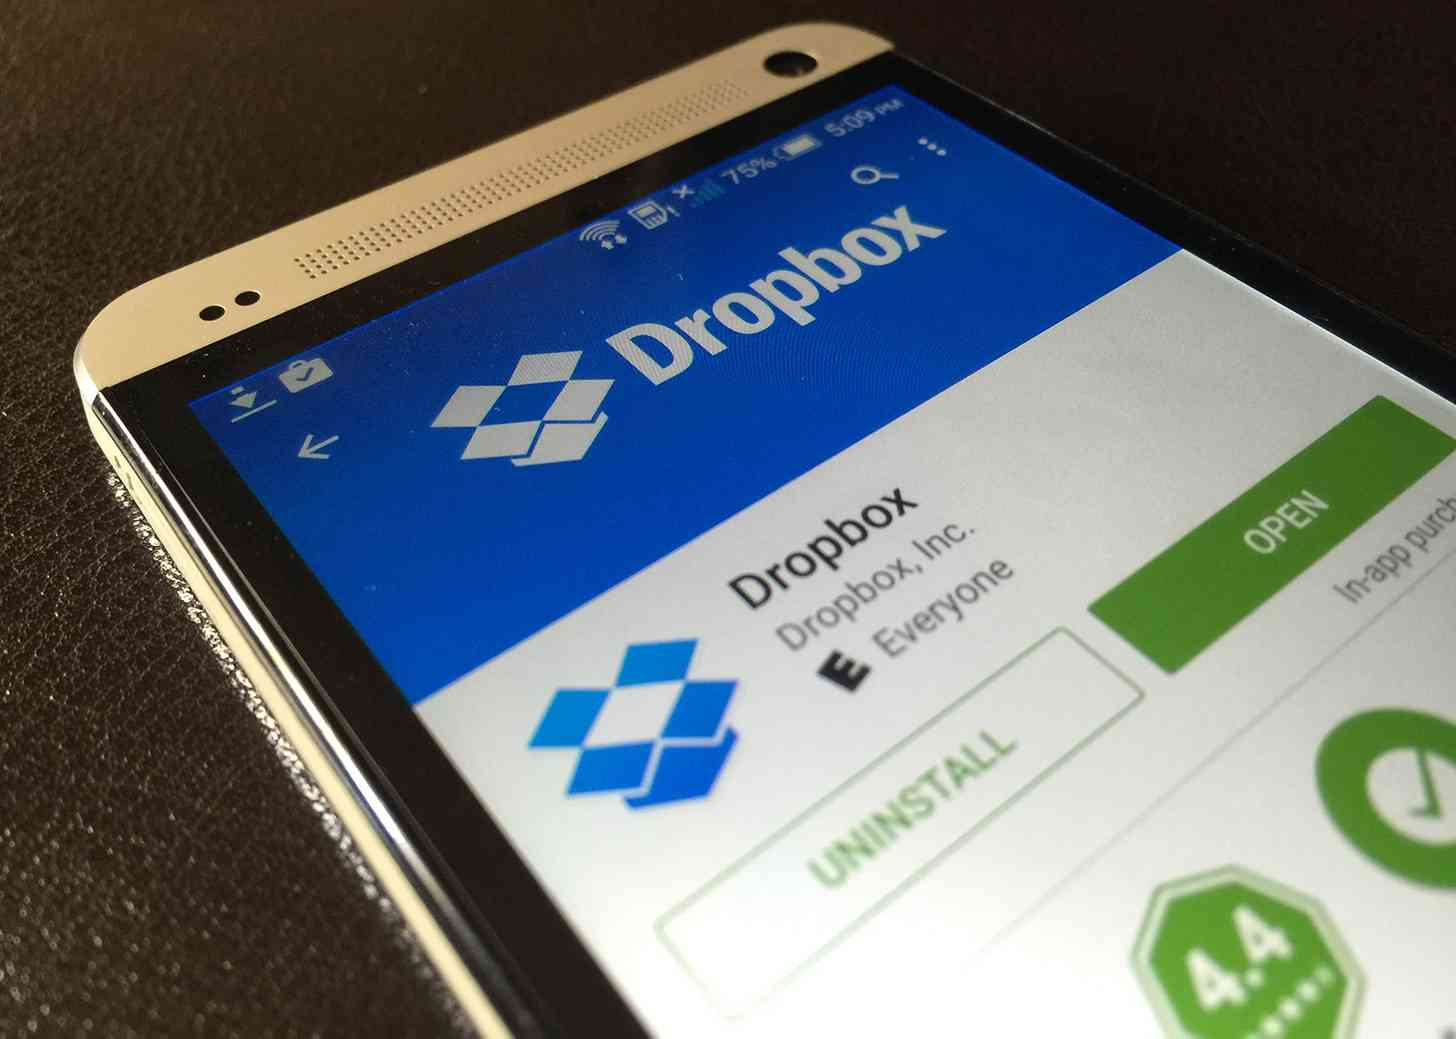 Dropbox Google Play